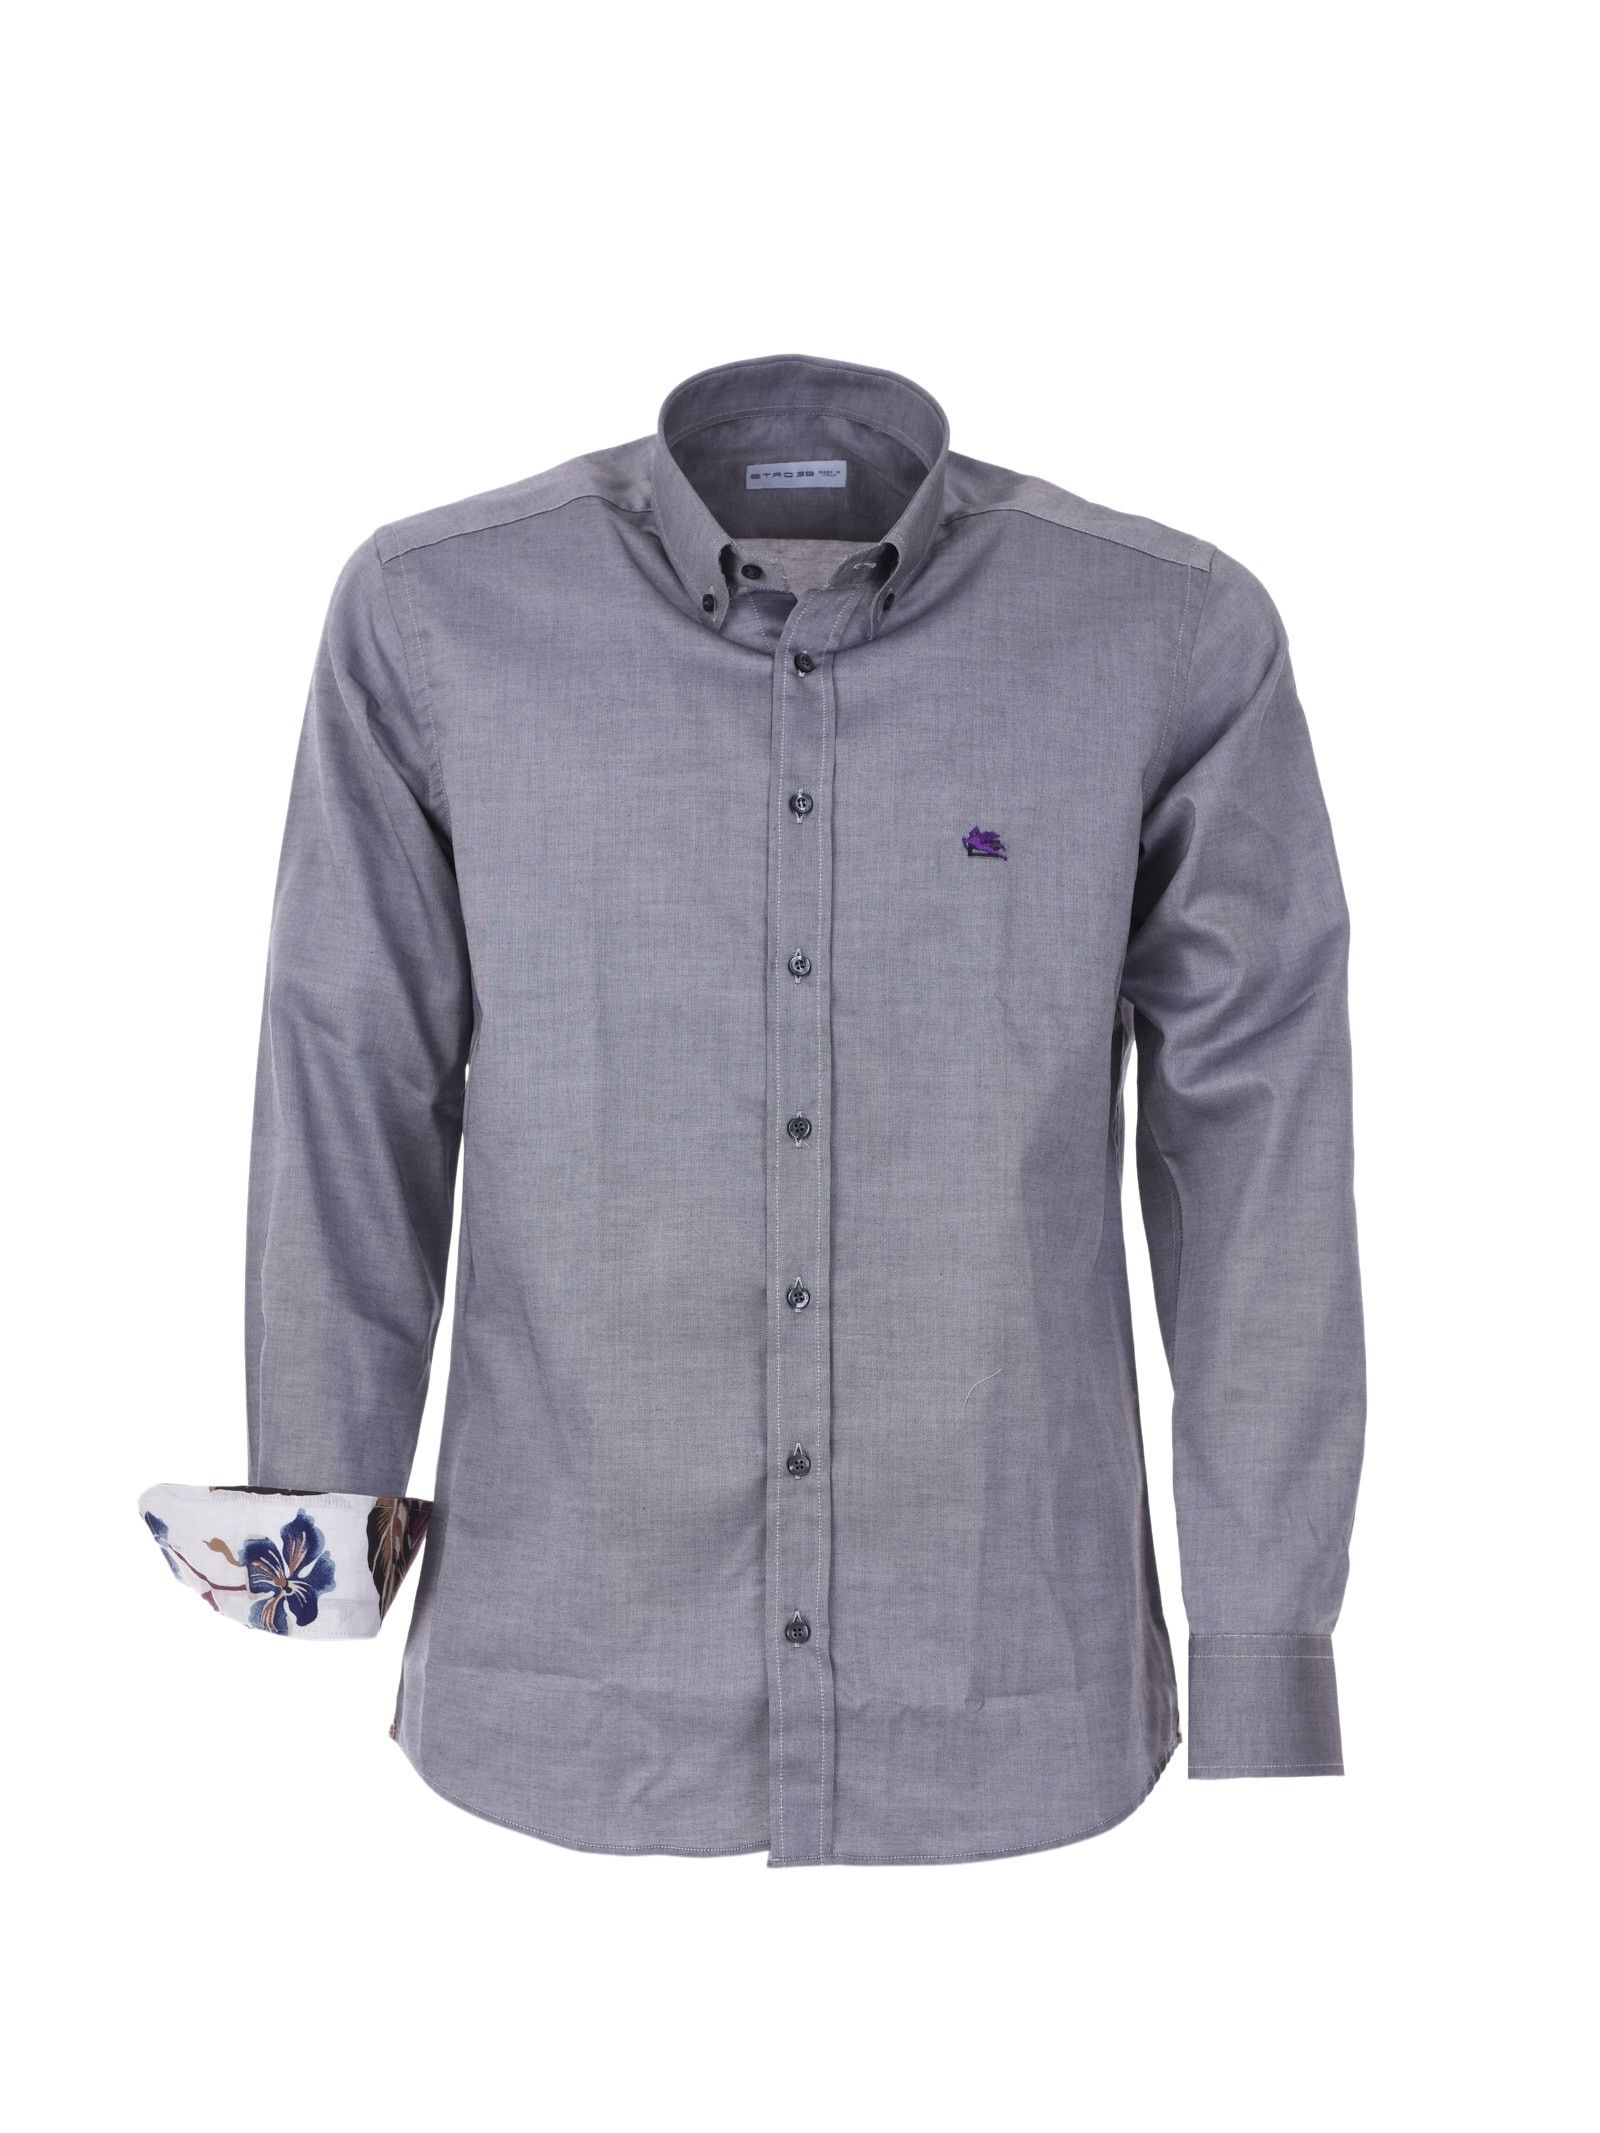 Etro Grey Cotton Shirt